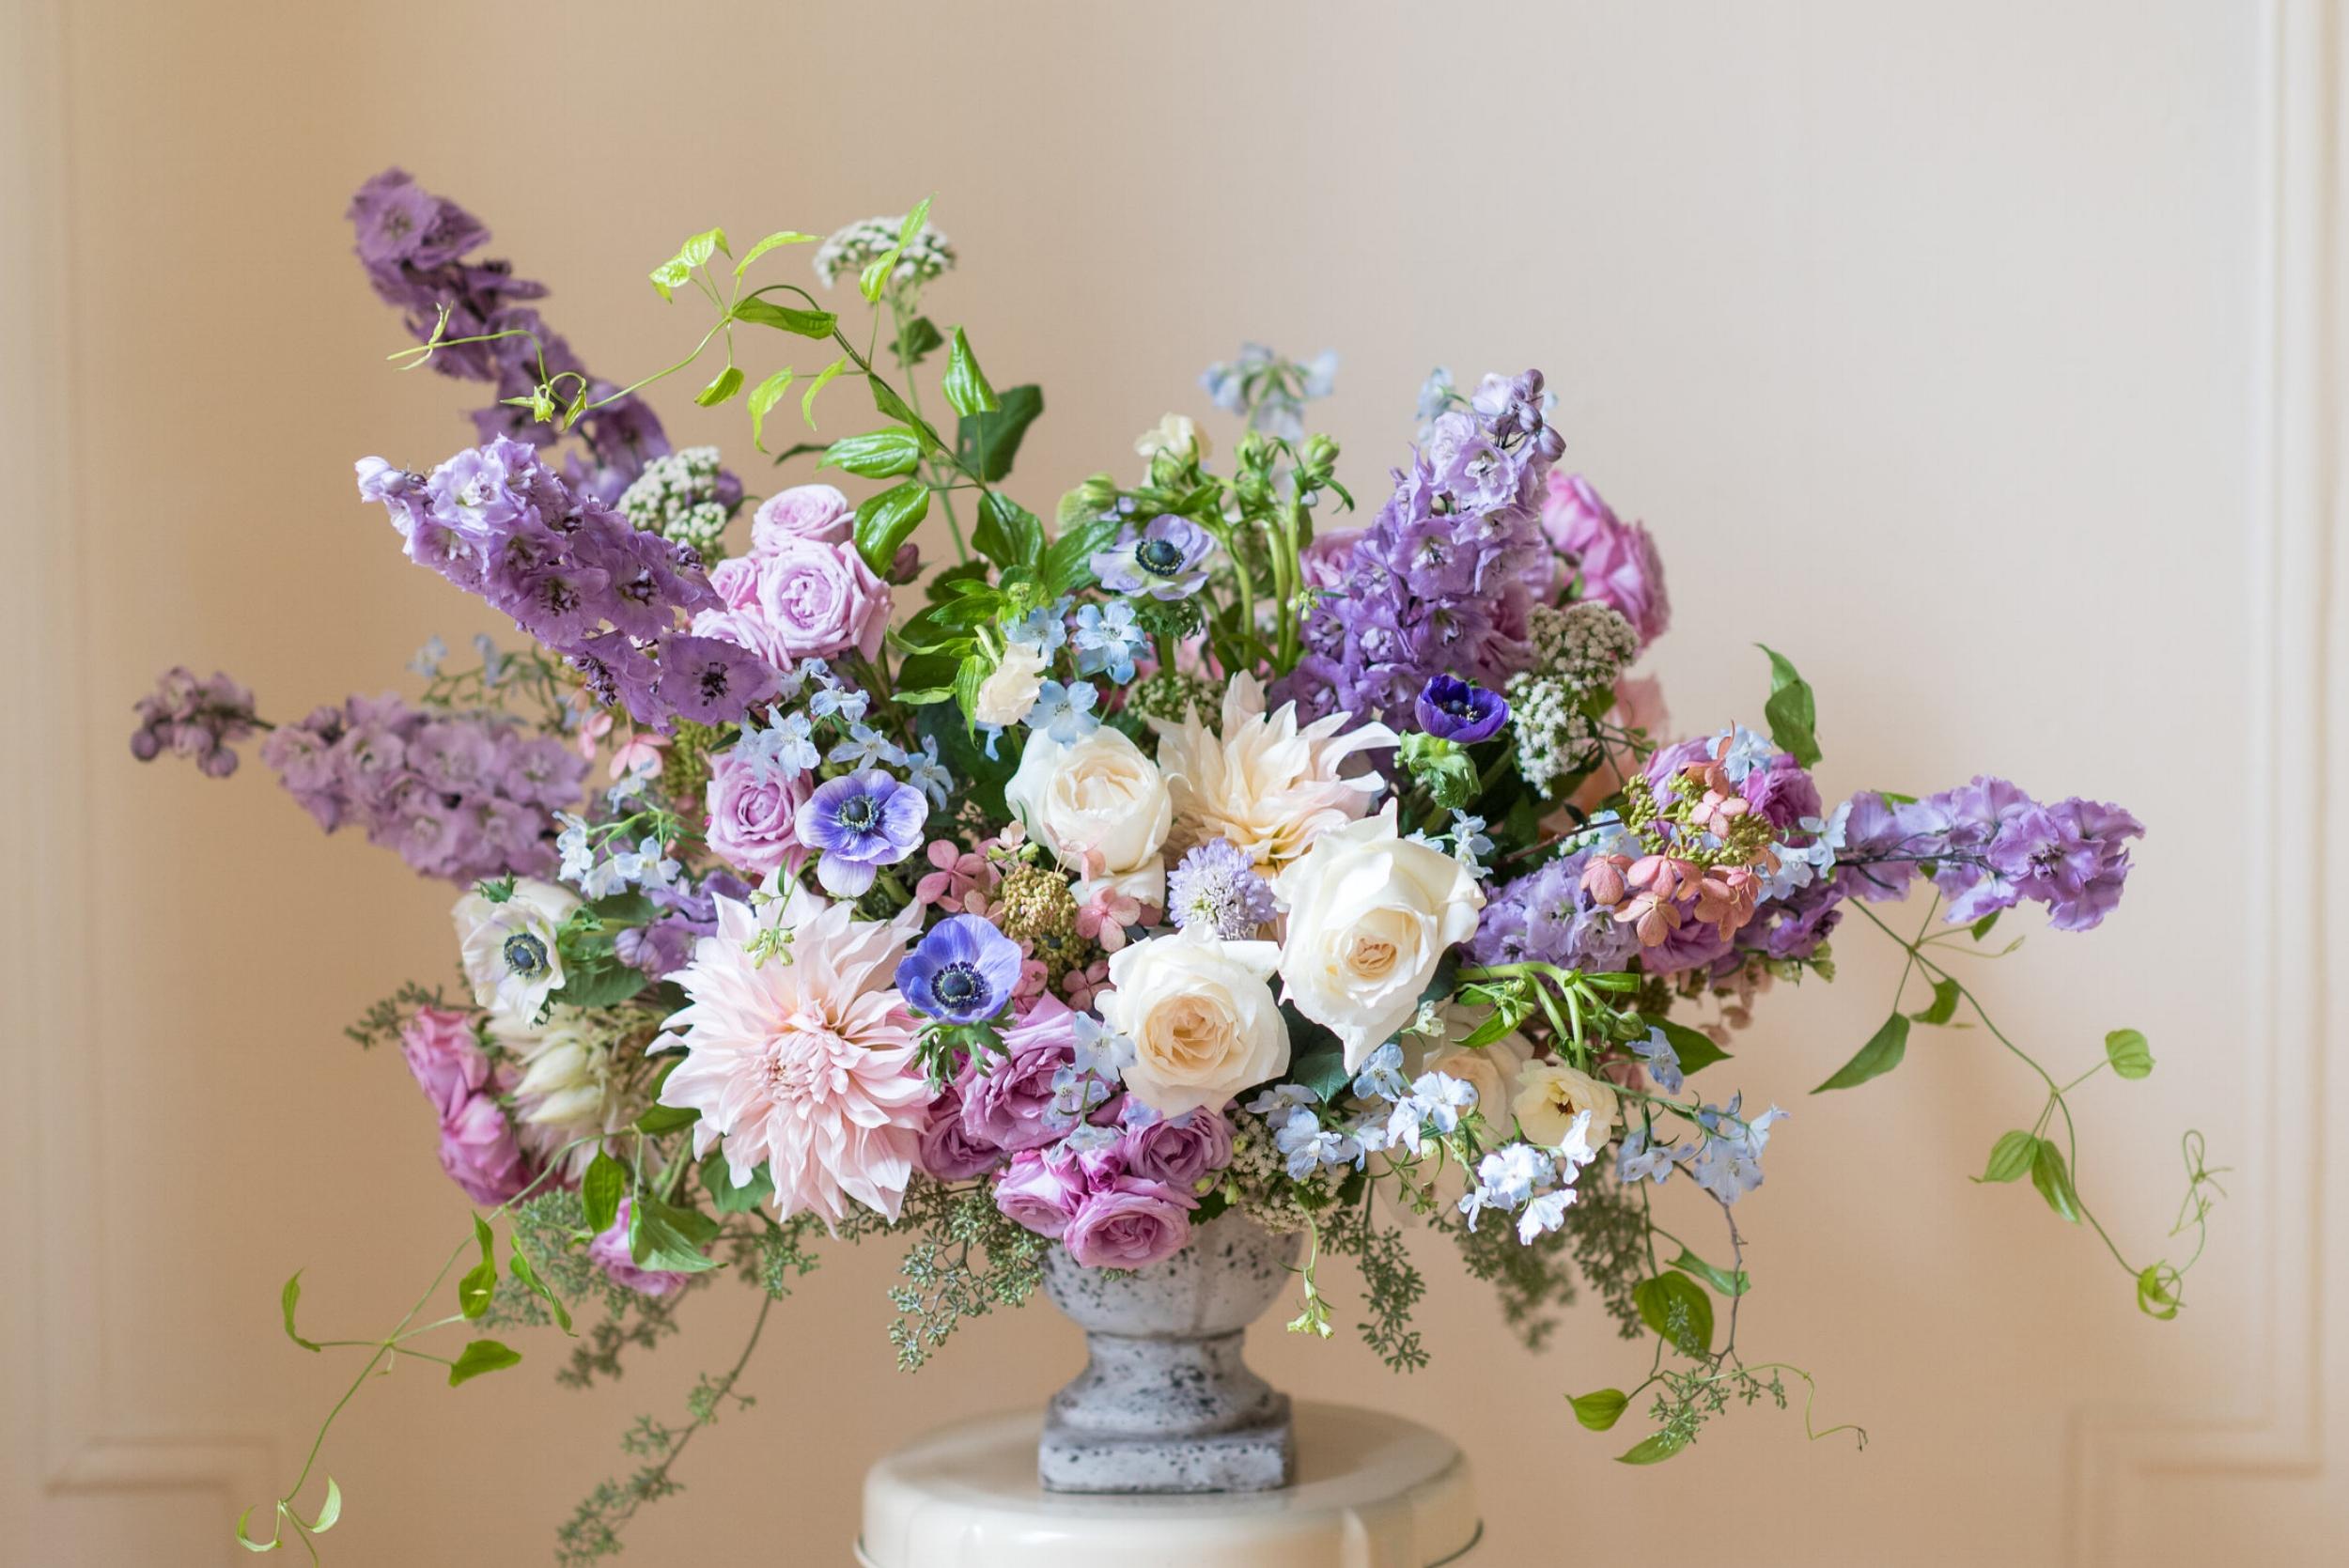 Sachi Rose Floral Design